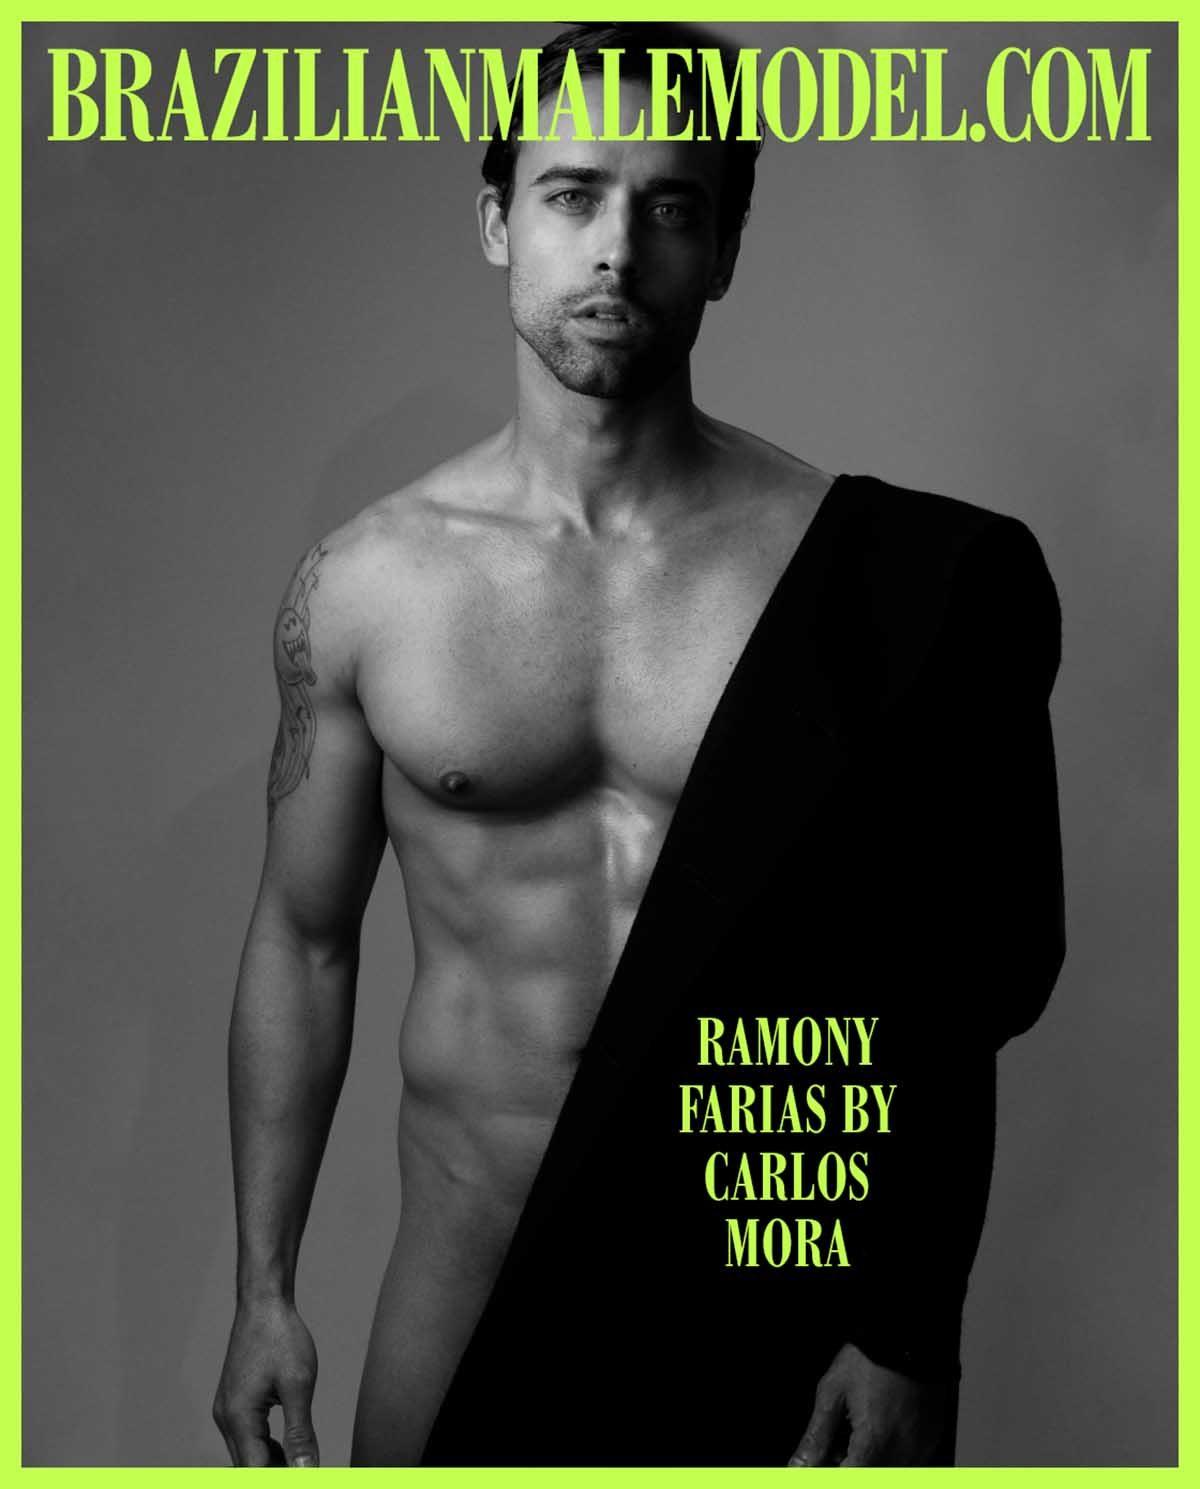 Ramony Farias by Carlos Mora